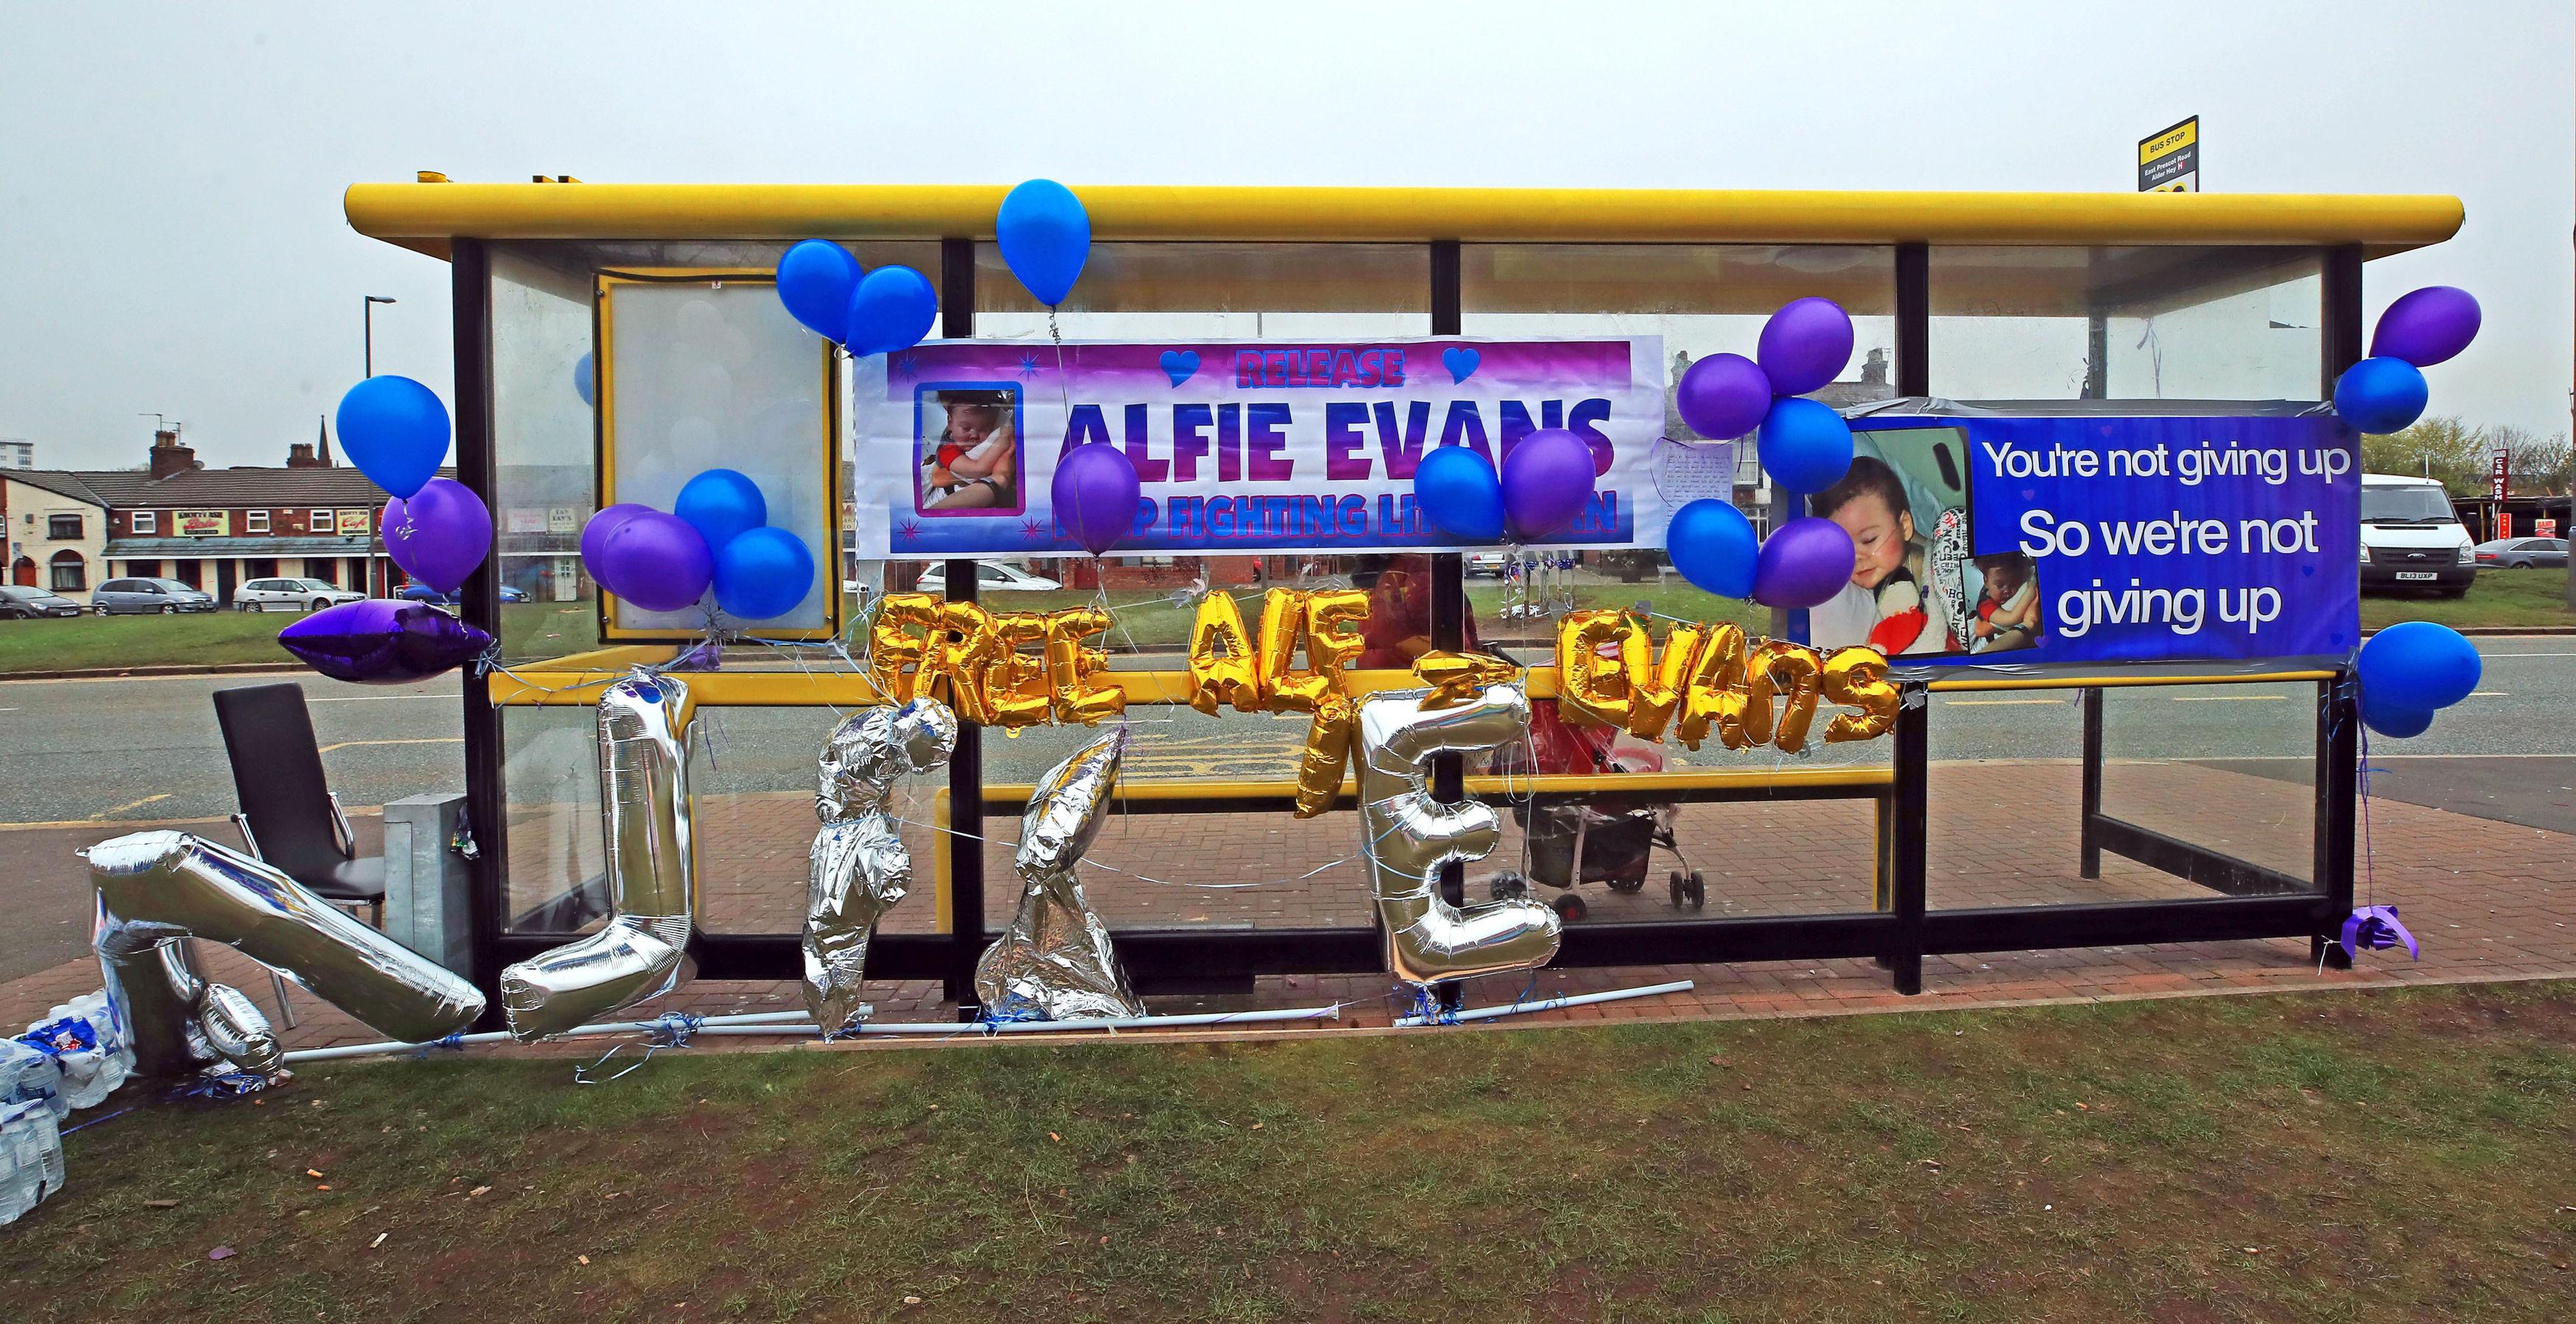 Solidarietà per Alfie Evans all'esterno dell'ospedale di Liverpool Solidarietà per Alfie Evans all'esterno dell'ospedale di Liverpool